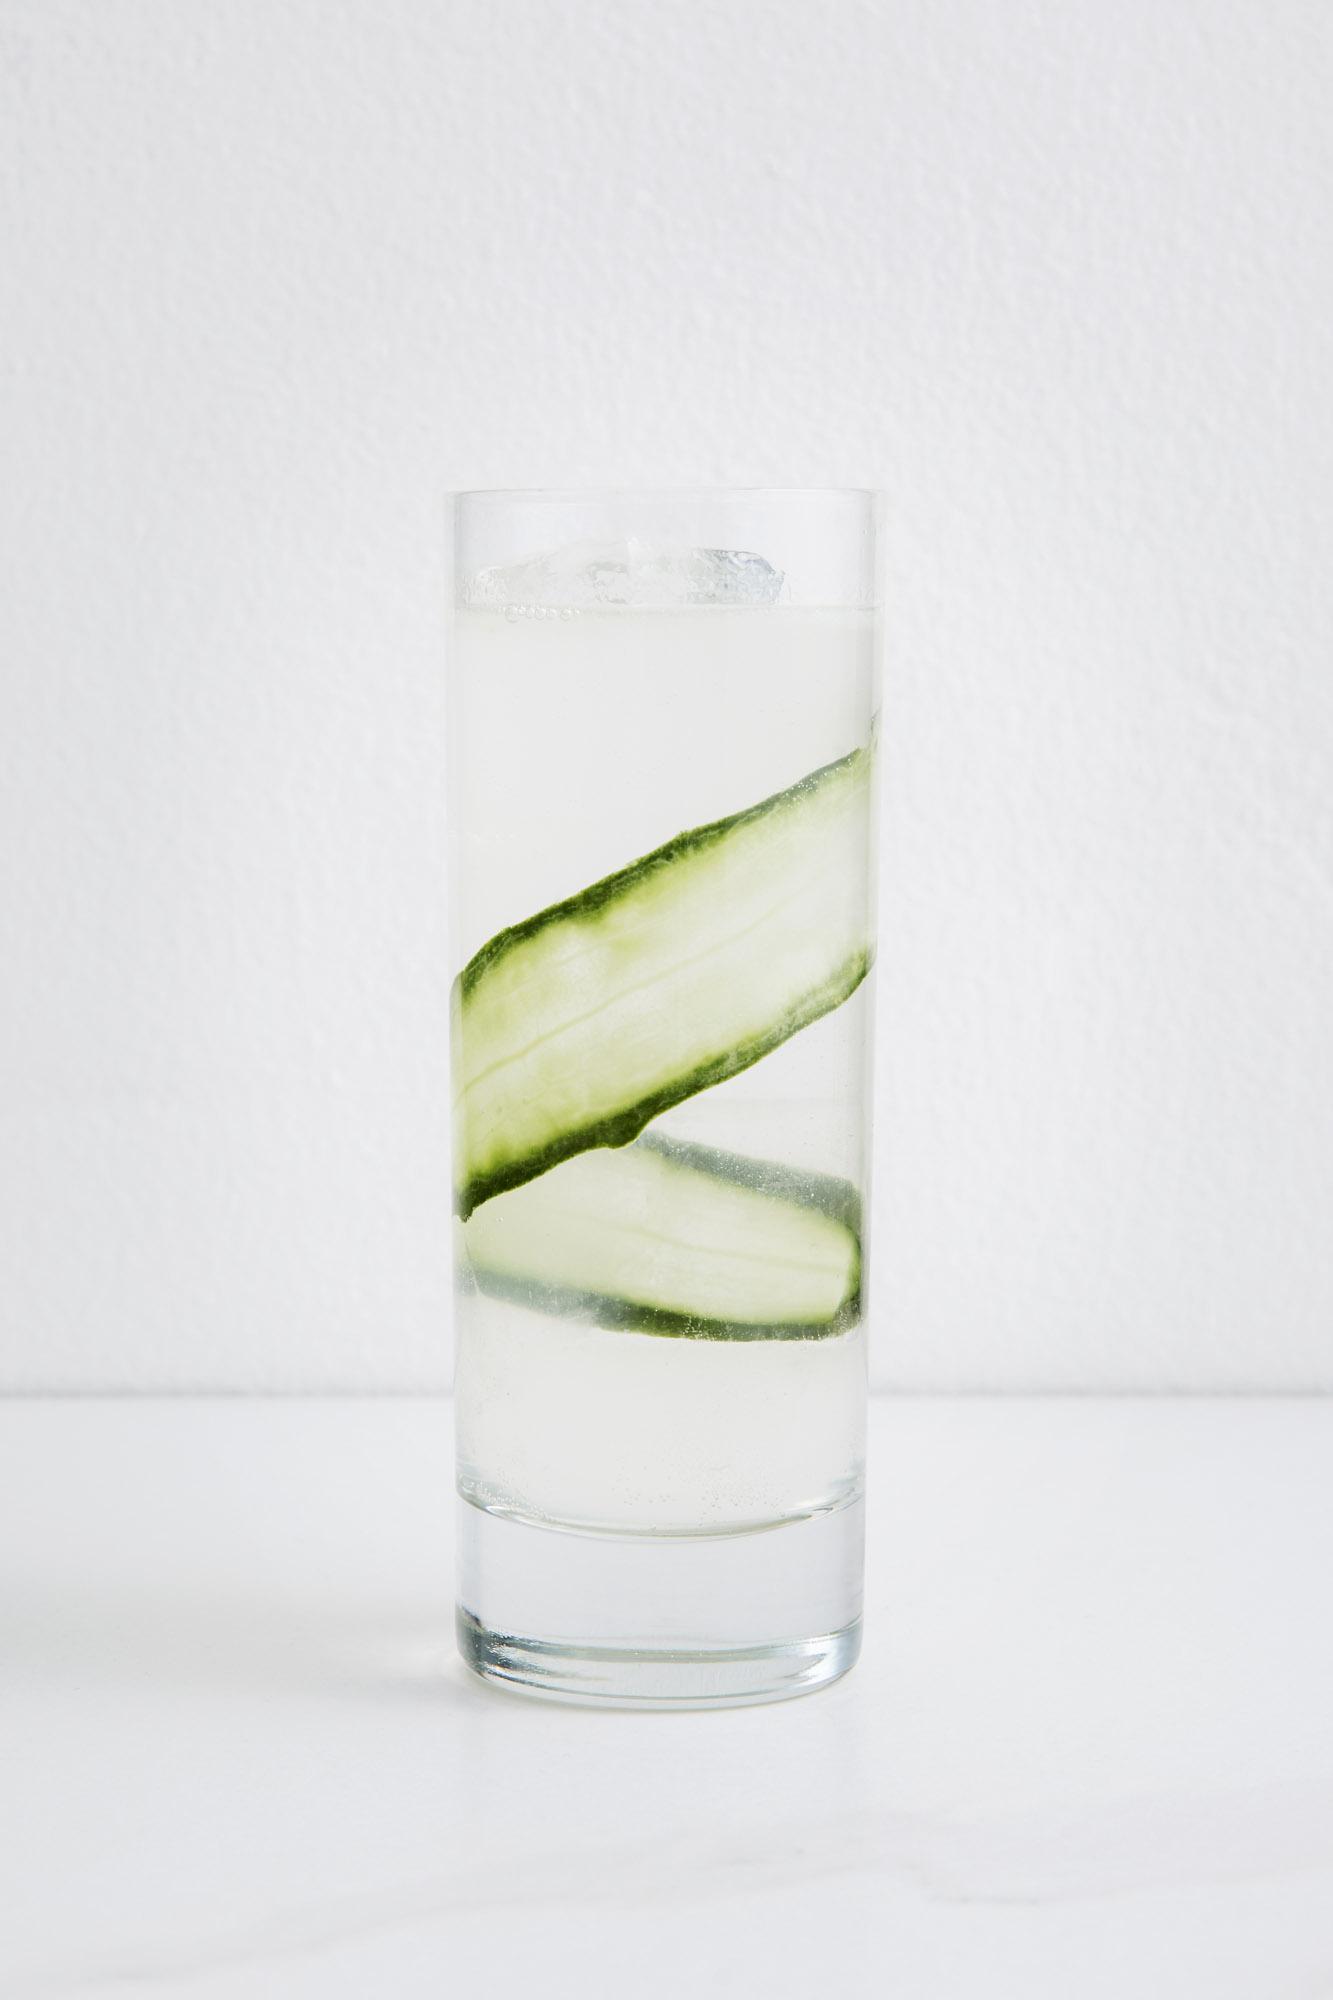 SPA COCKTAIL   1 1/2 oz Vodka  1 oz Chareau  1 ozFresh Lemon Juice  1/4 oz Simple Syrup  Soda  Shake Vodka, Chareau, lemon juice, and simple syrup with ice. Strain and pour over ice. Top with soda and garnish with fresh Cucumber.